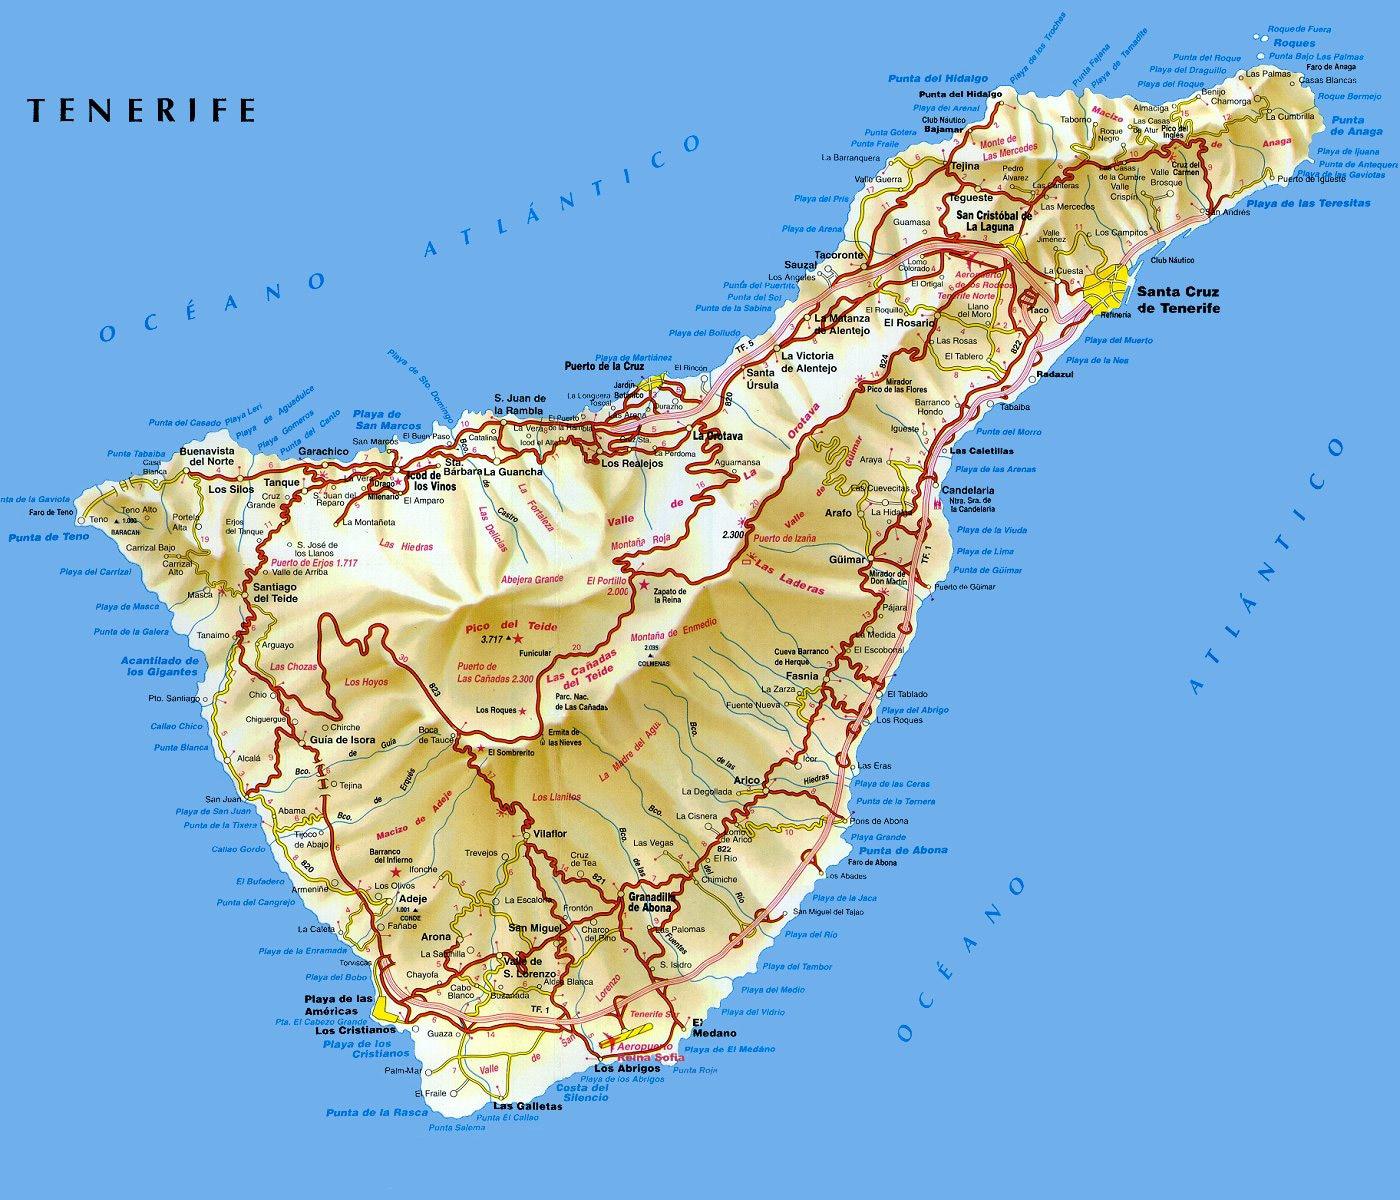 kart over tenerife og gran canaria Tenerife Ferie: Reisetips om Tenerife kart over tenerife og gran canaria